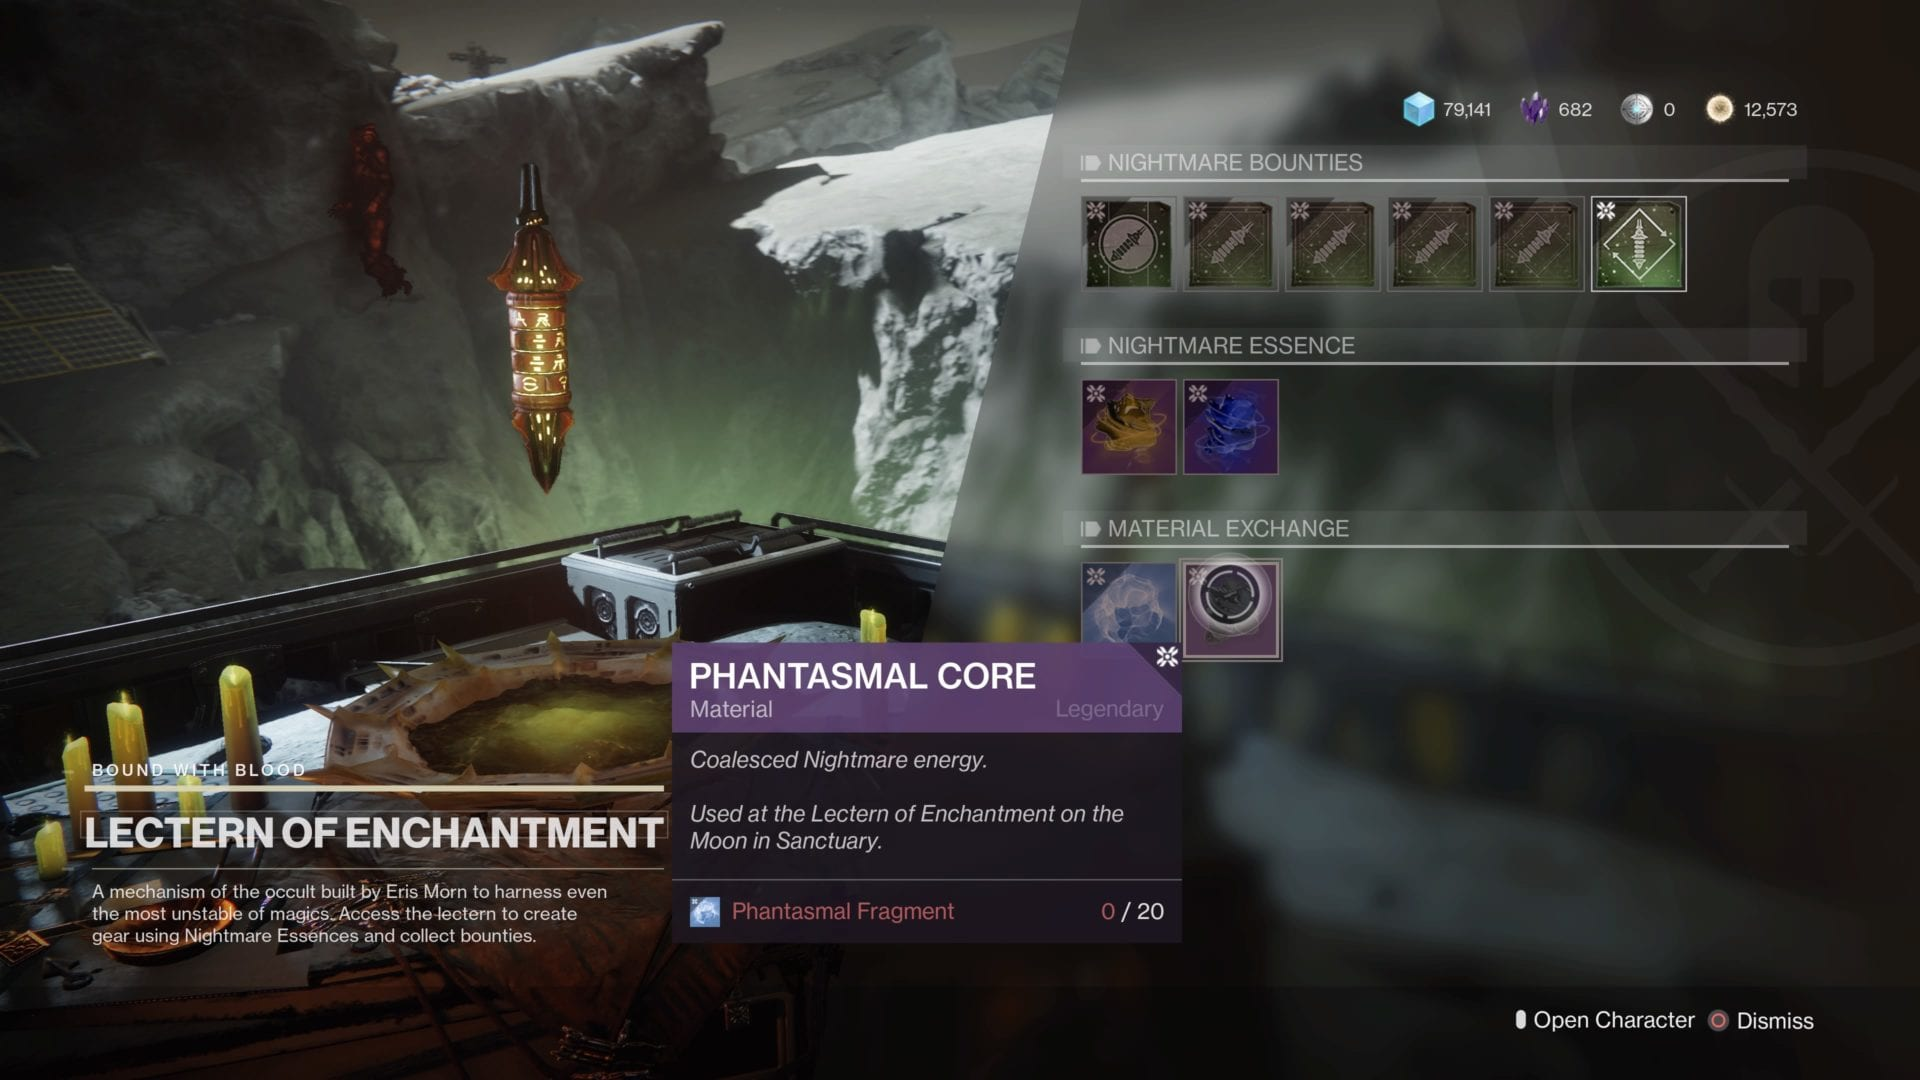 phantasmal cores, destiny 2, how to get, shadowkeep